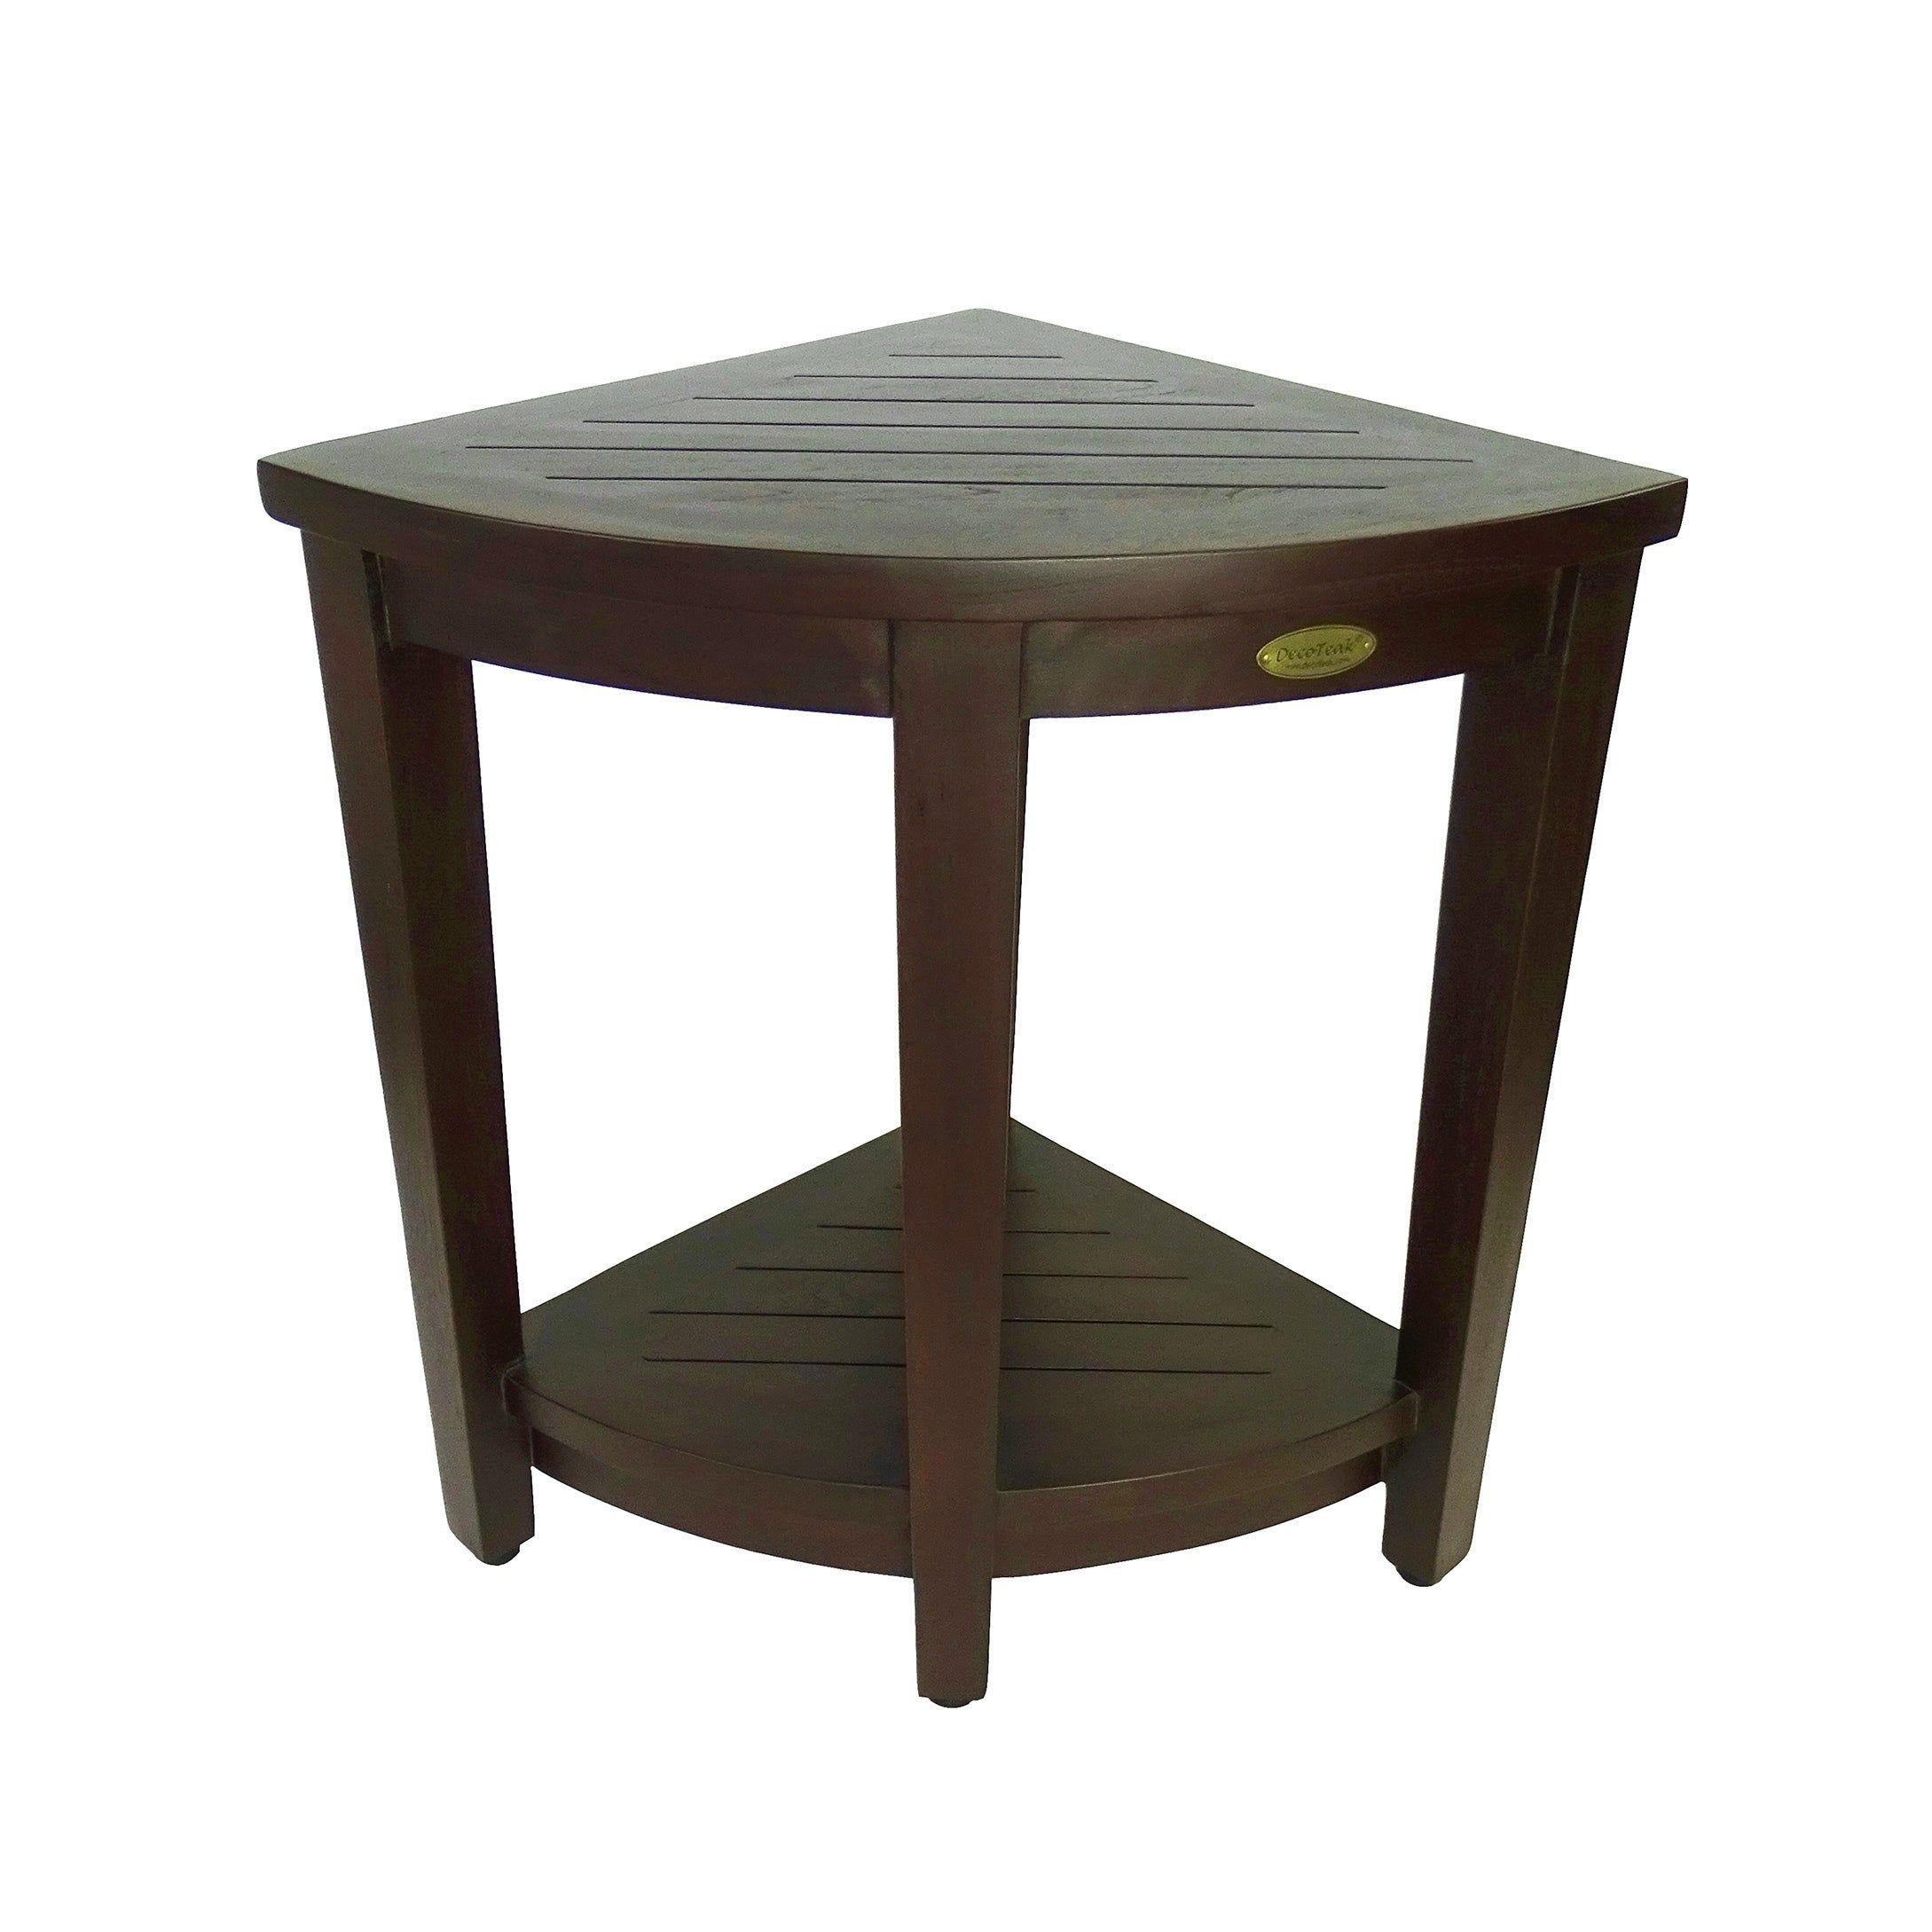 Decoteak Oasis Extended Height Teak Corner Shower Bench With Shelf